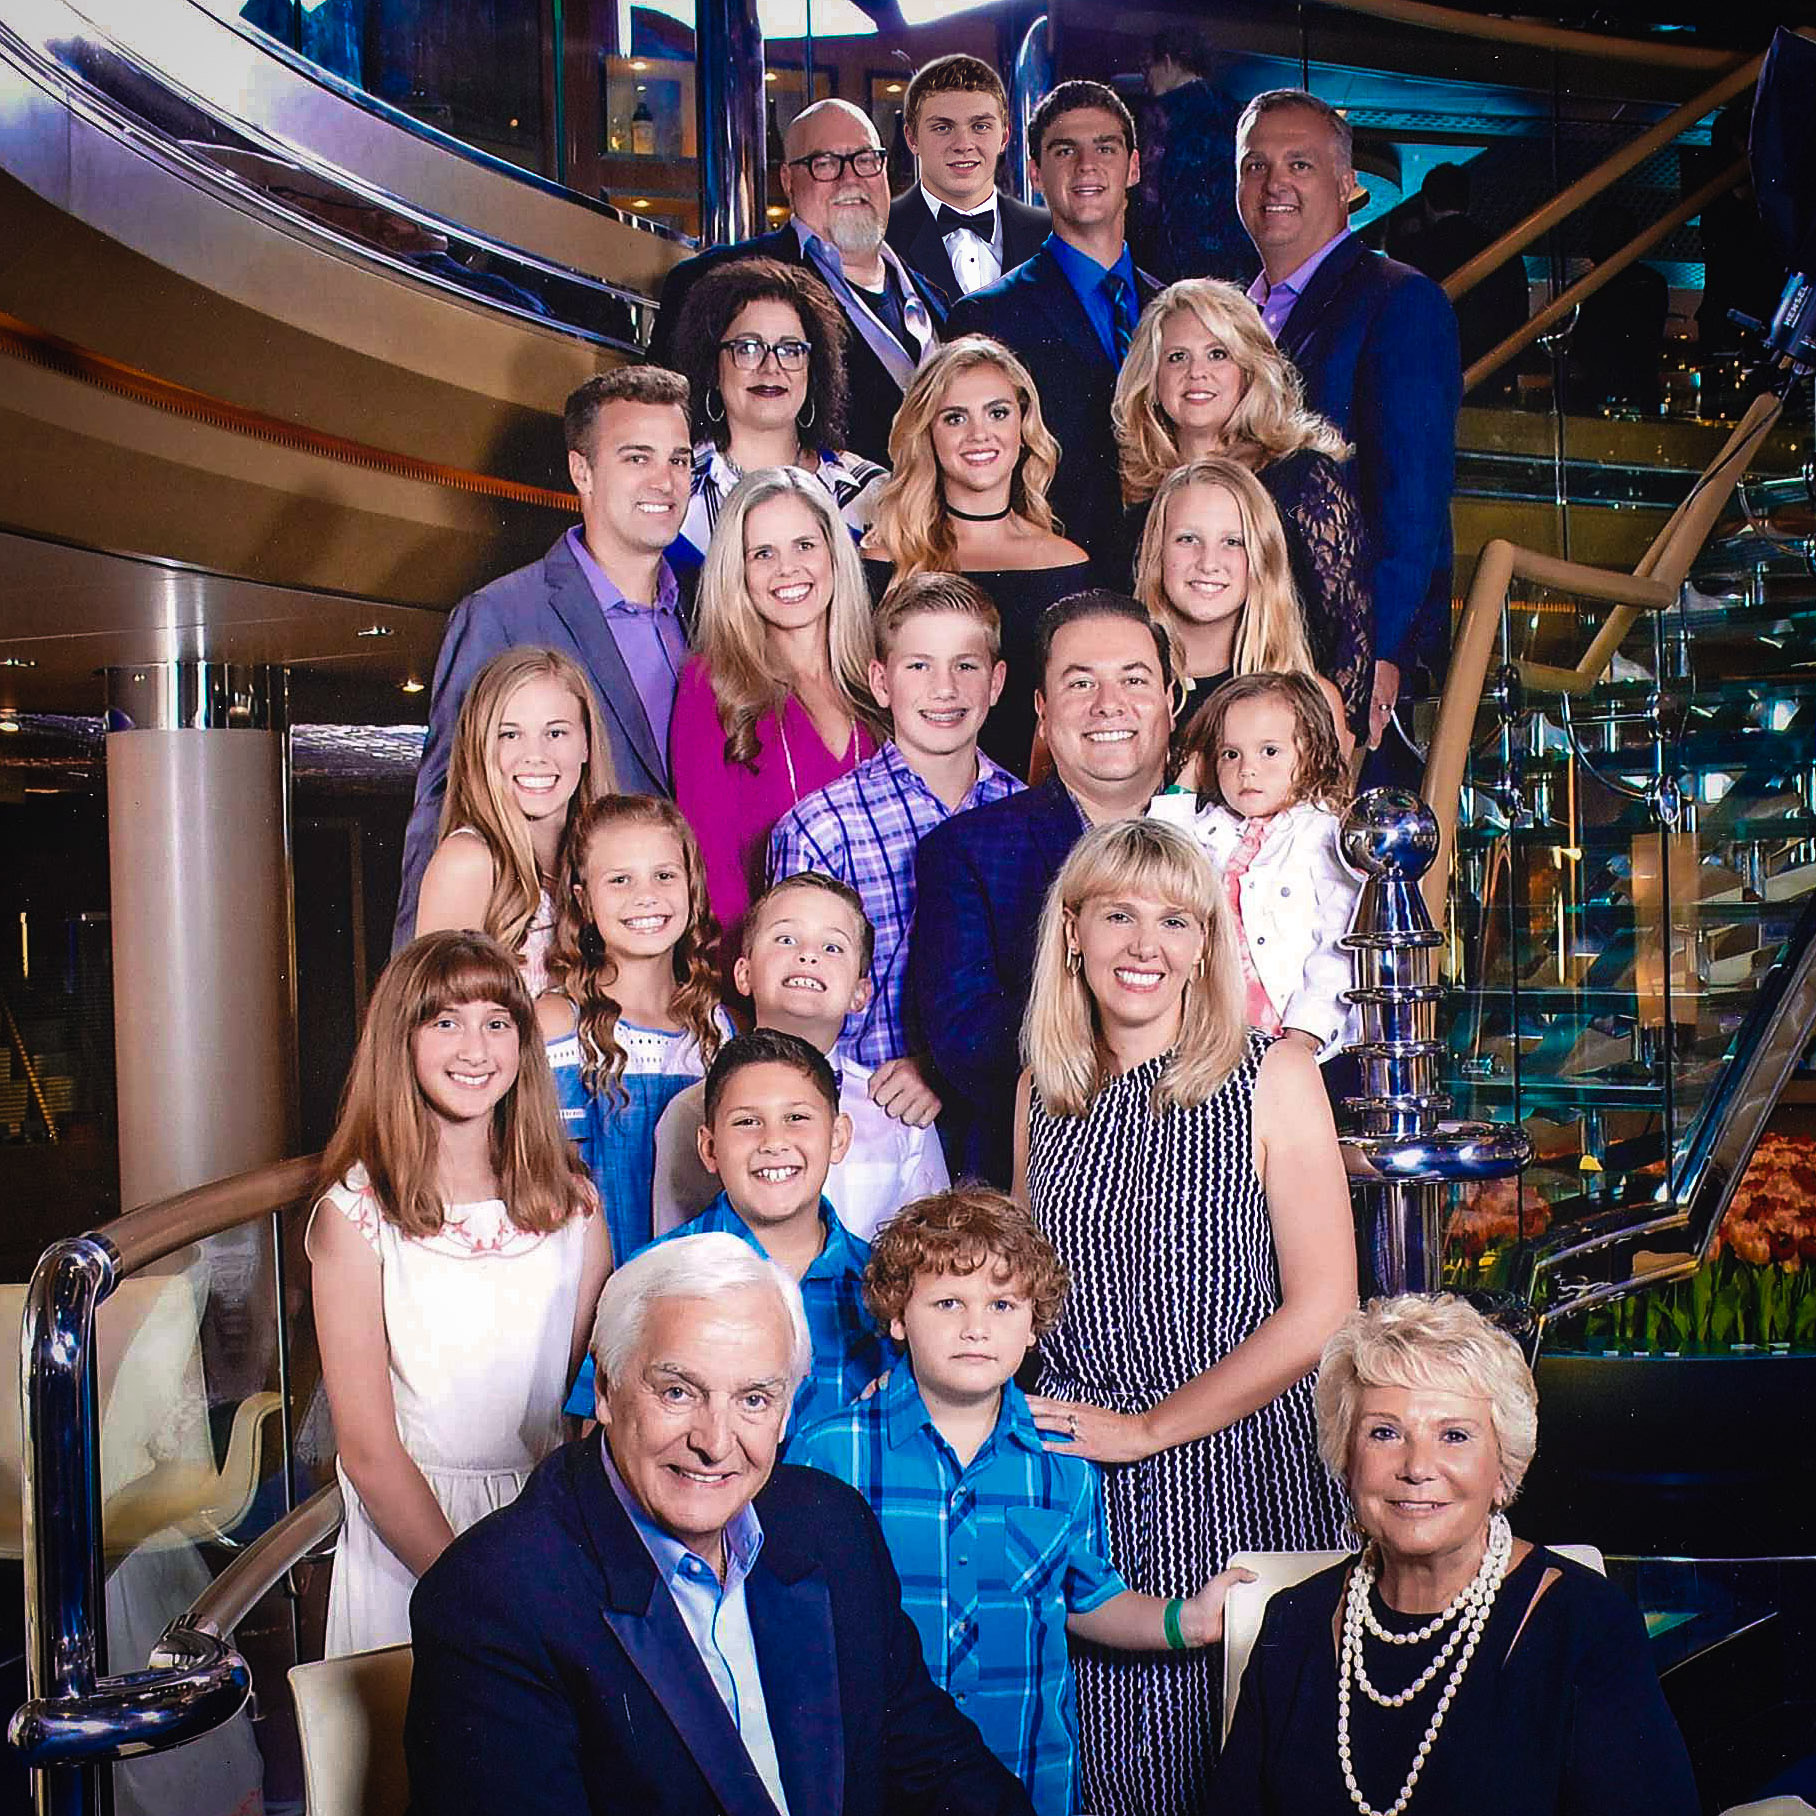 Dr David Jeremiah and family